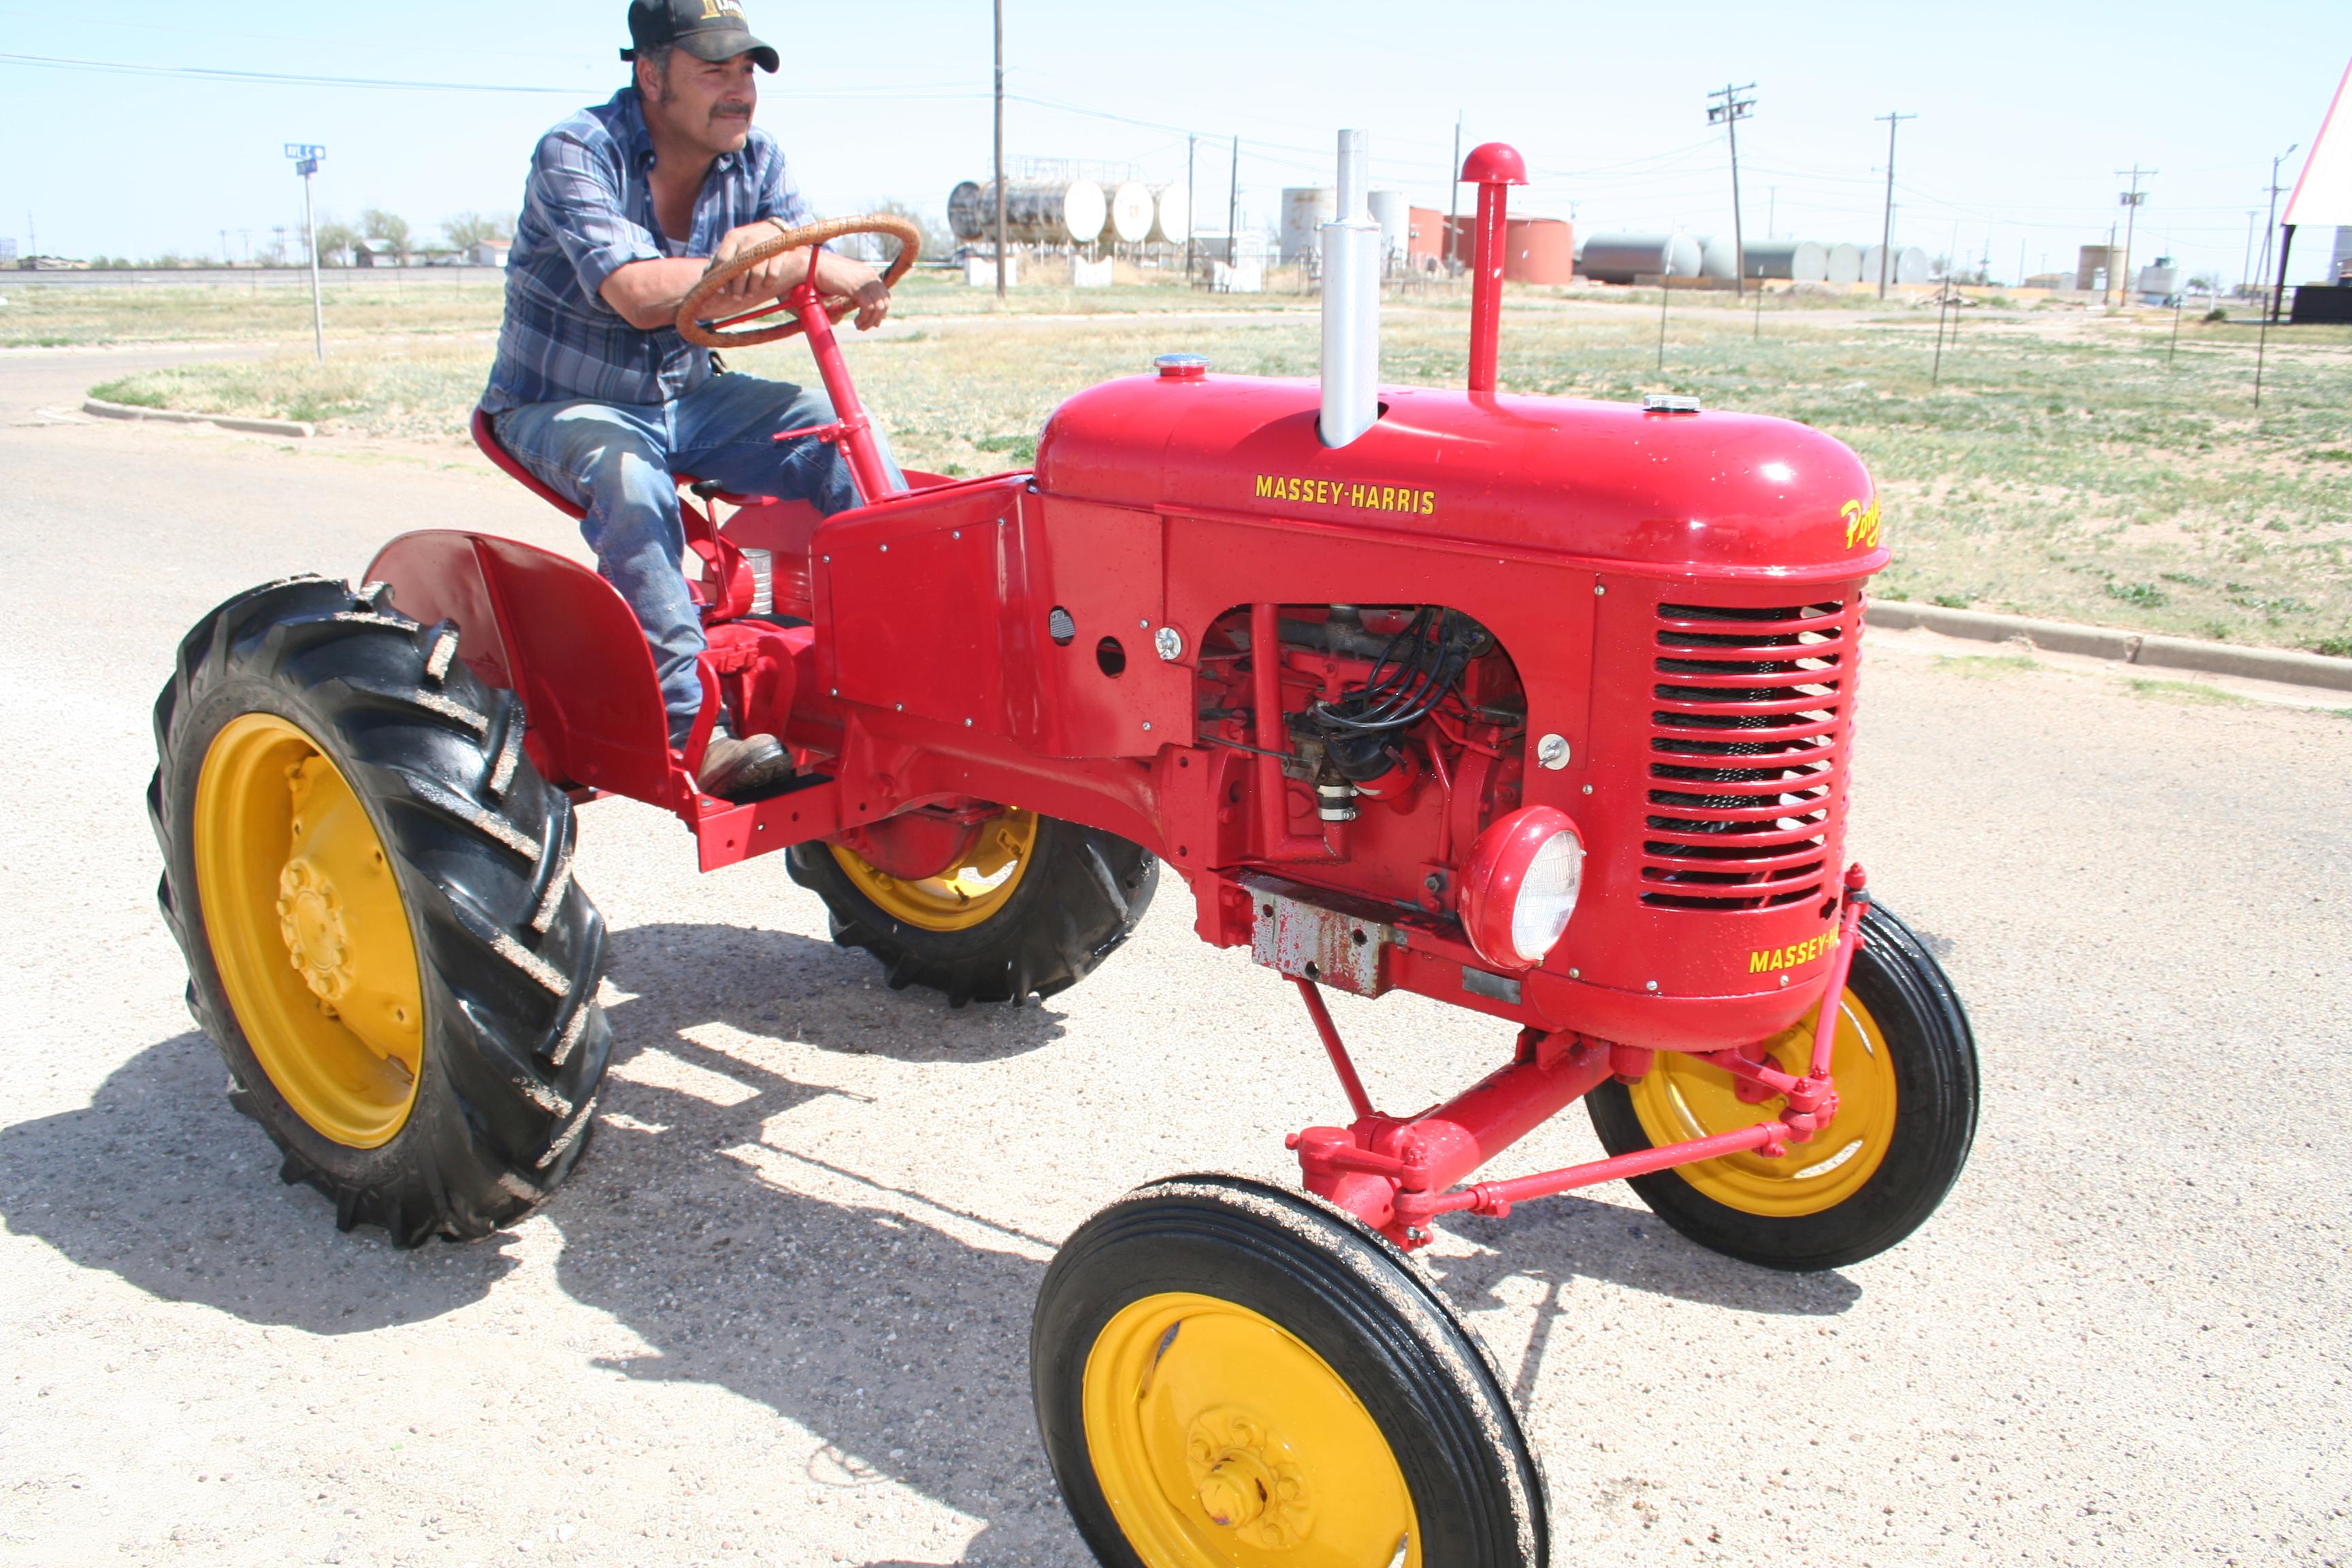 Massey Harris Tractor : Massey harris pony troy s tractors